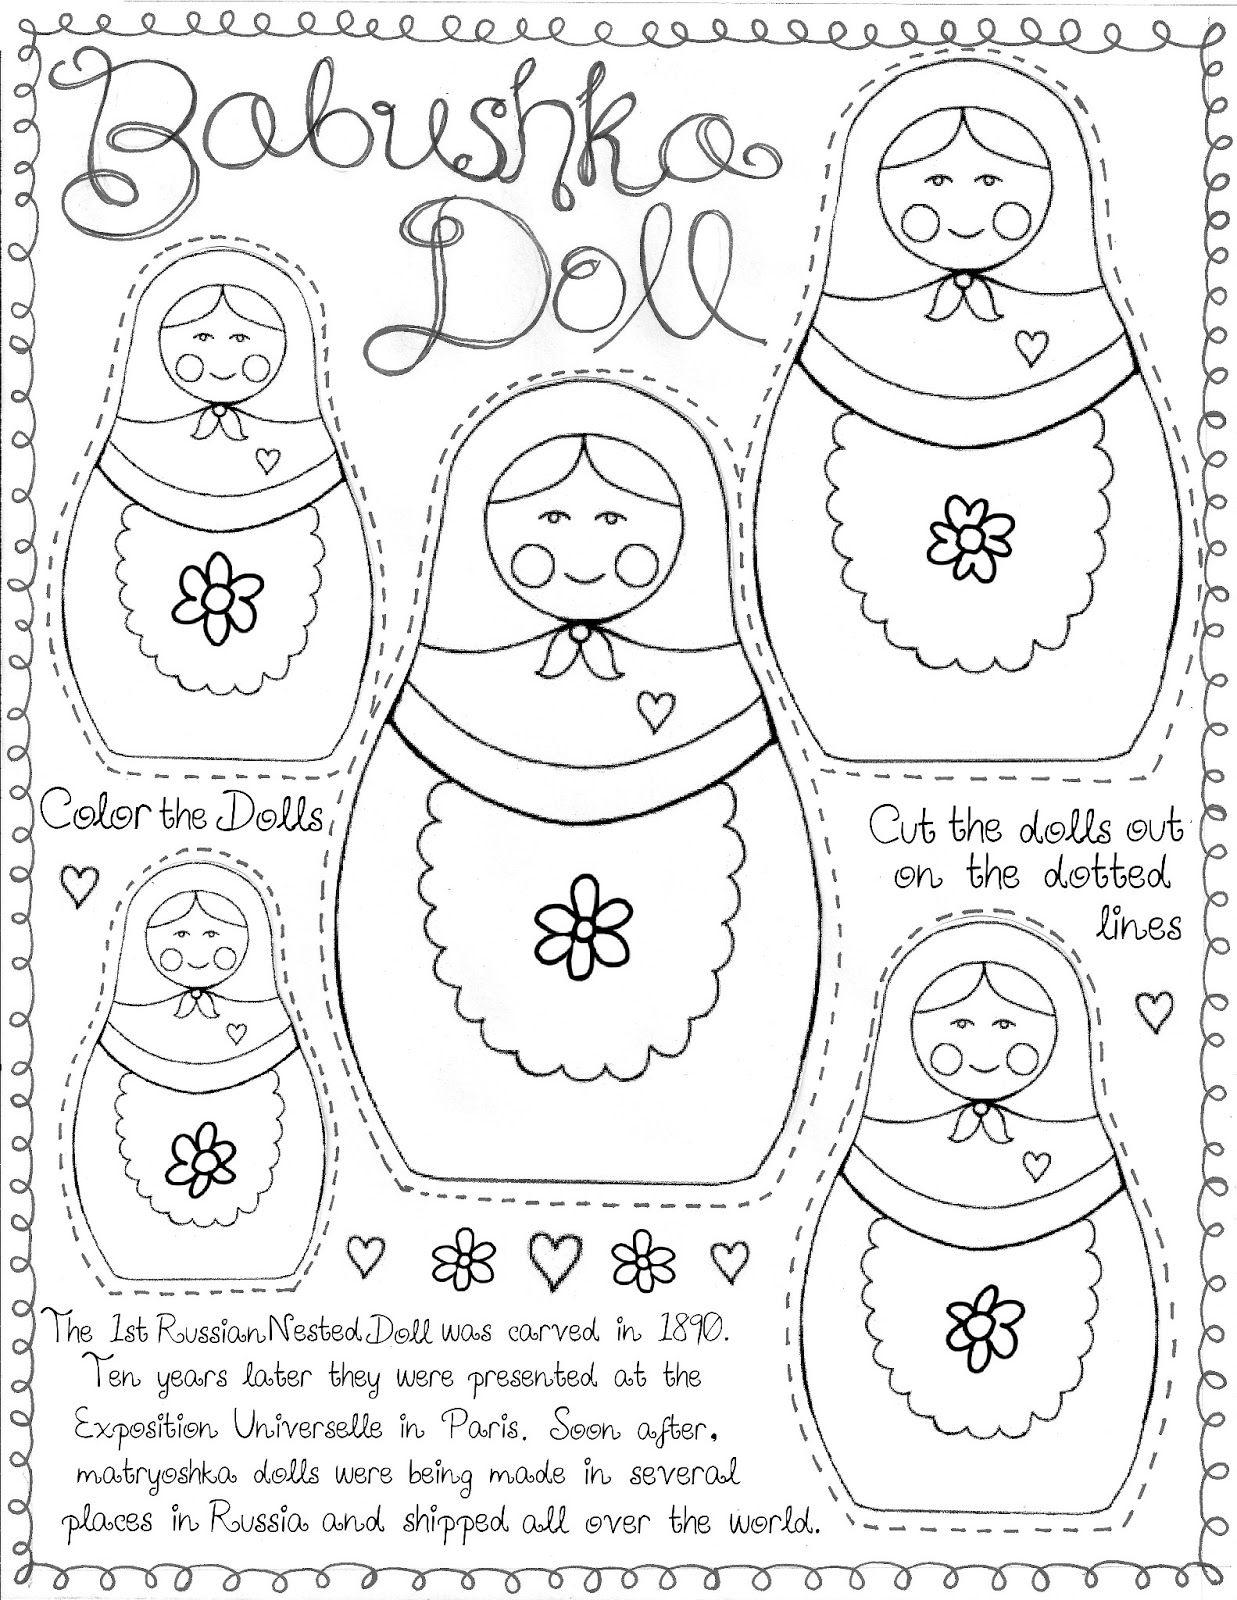 matryoshka doll printable for around the world culture study